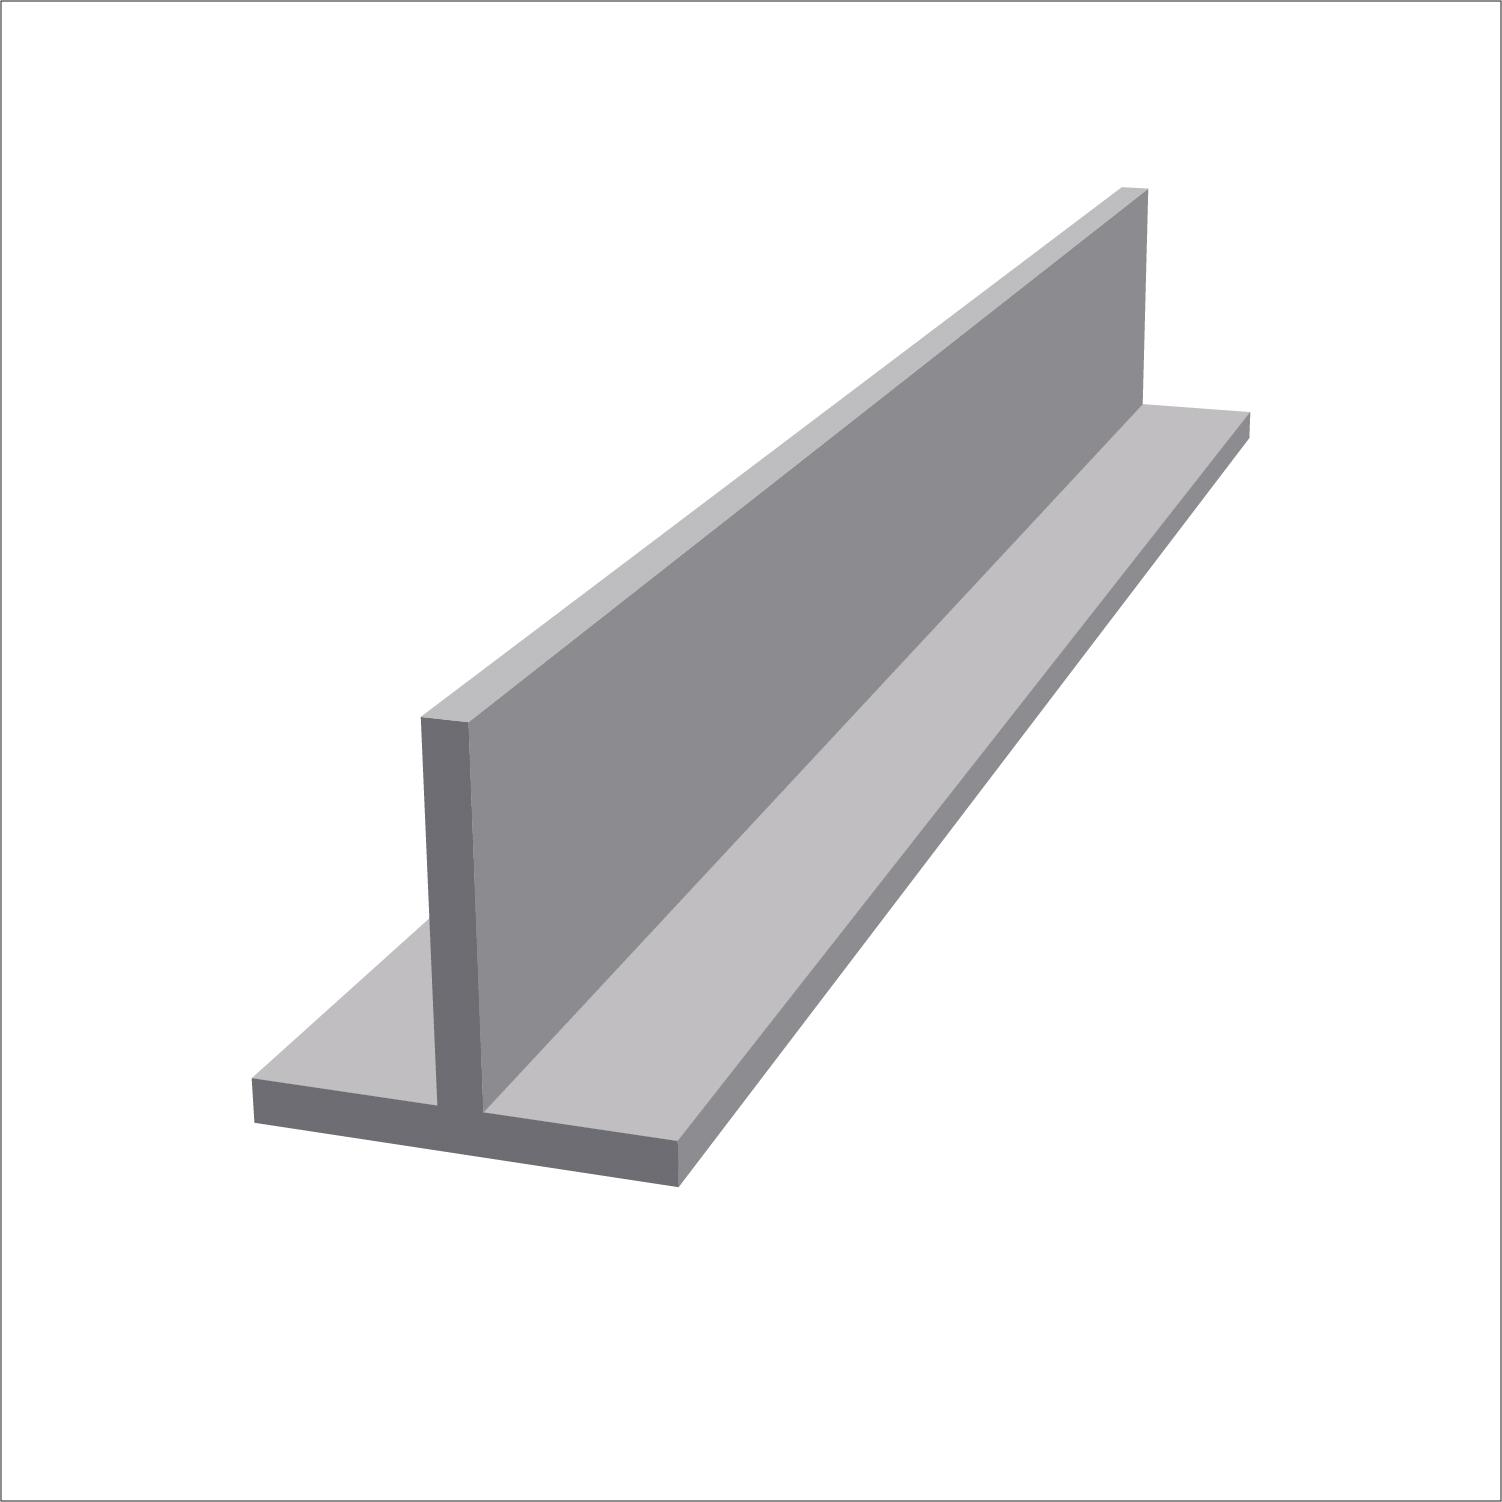 Aluminium Square Rectangular Tube Box Section size 12x8 ...